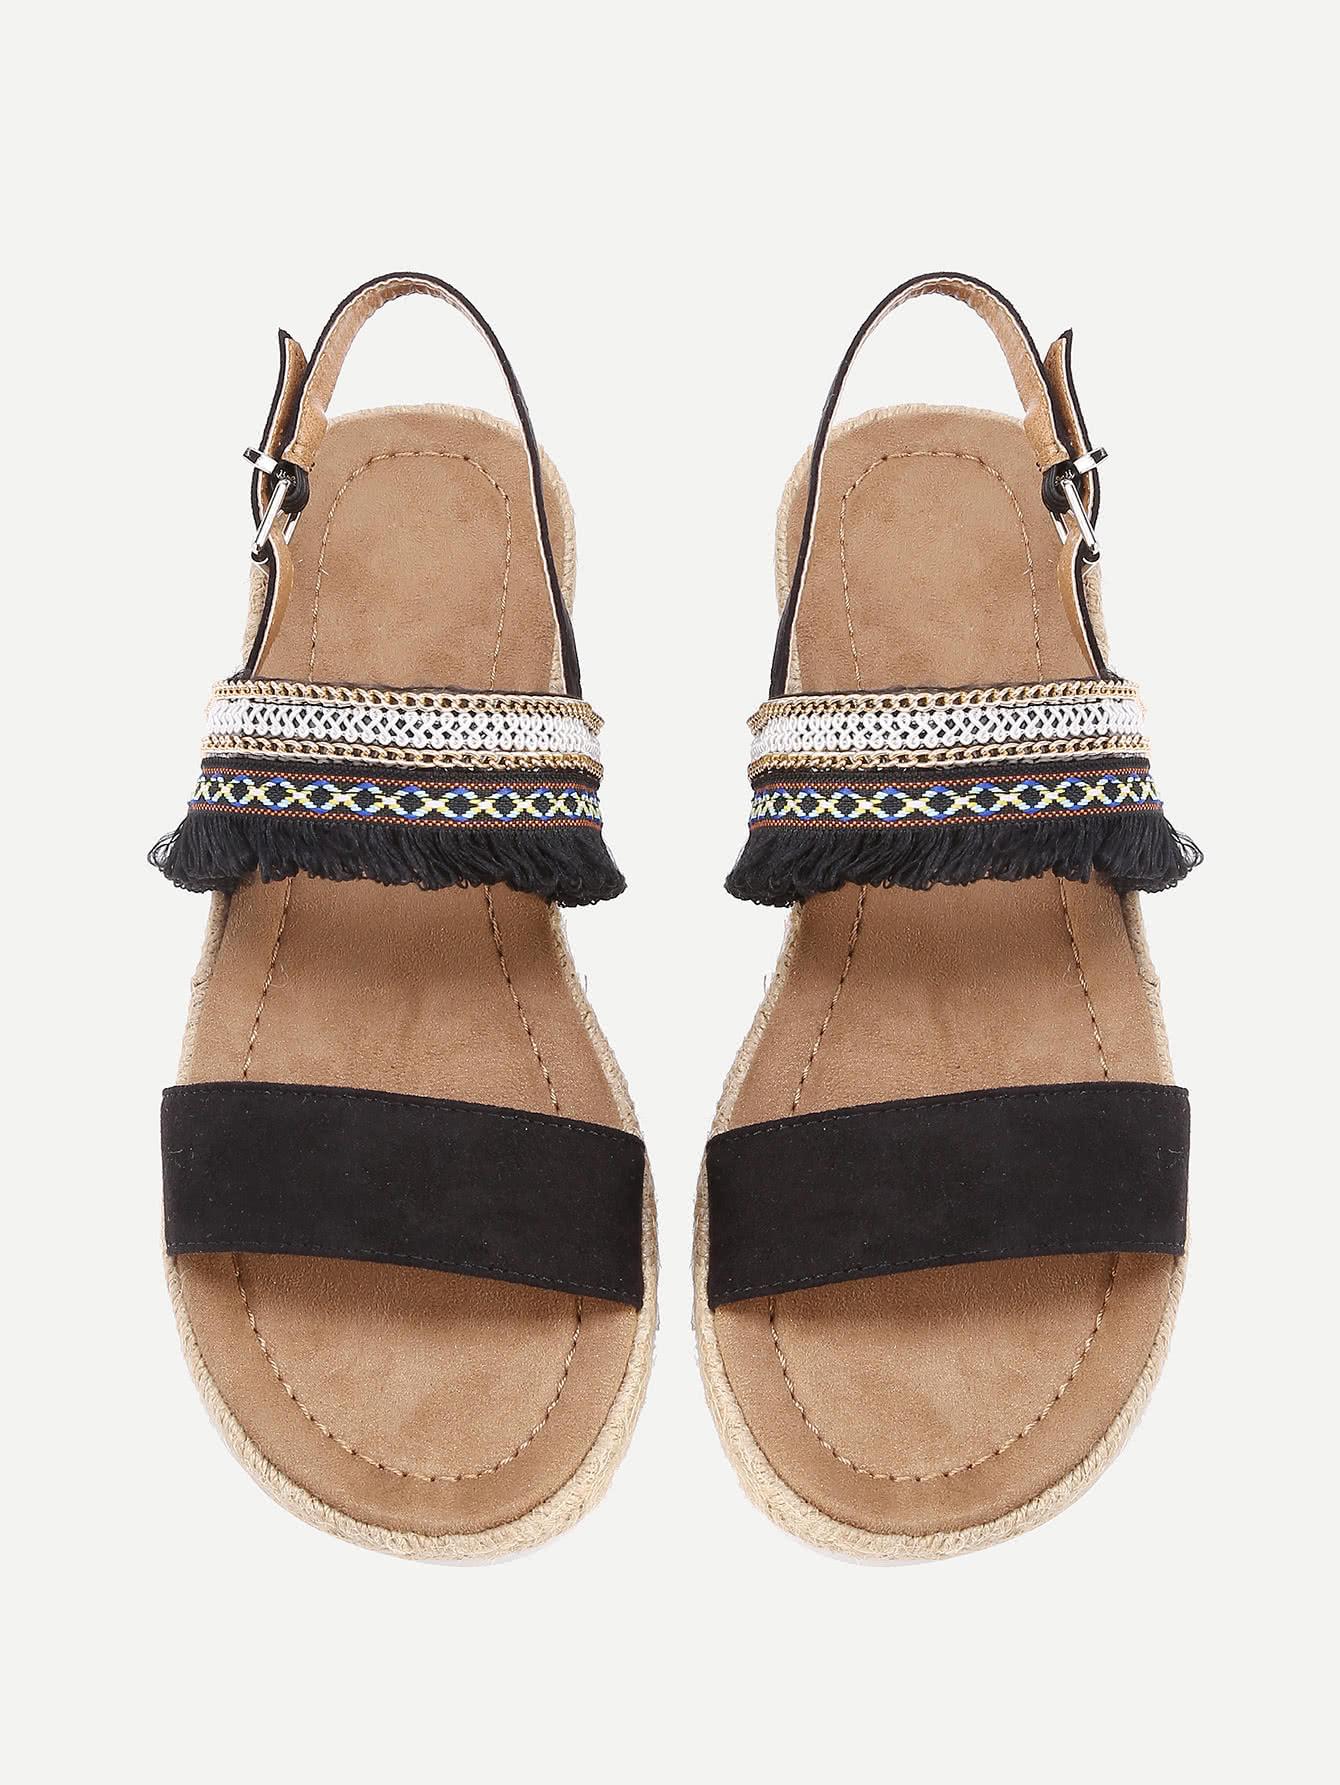 Fringe Detail Flat Sandals fringe detail beach sandals